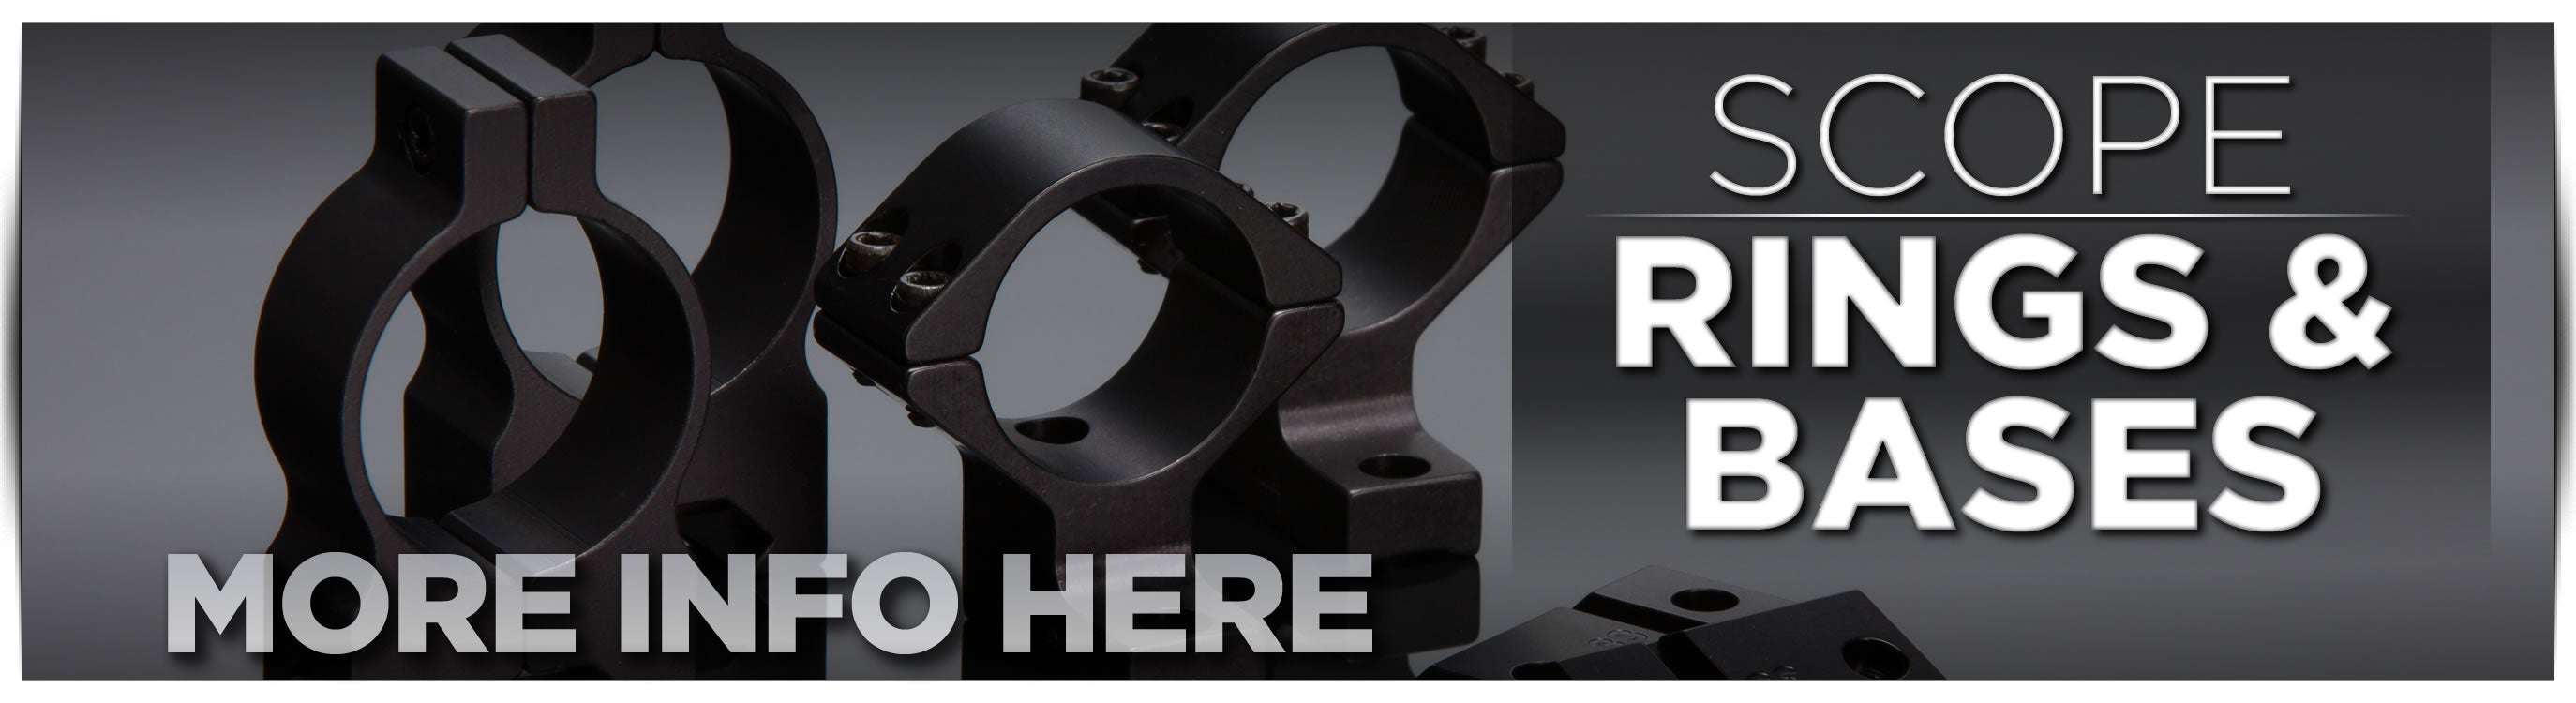 Browning Matte Standard 1 X-Lock Base System 12501 Neu Spiele